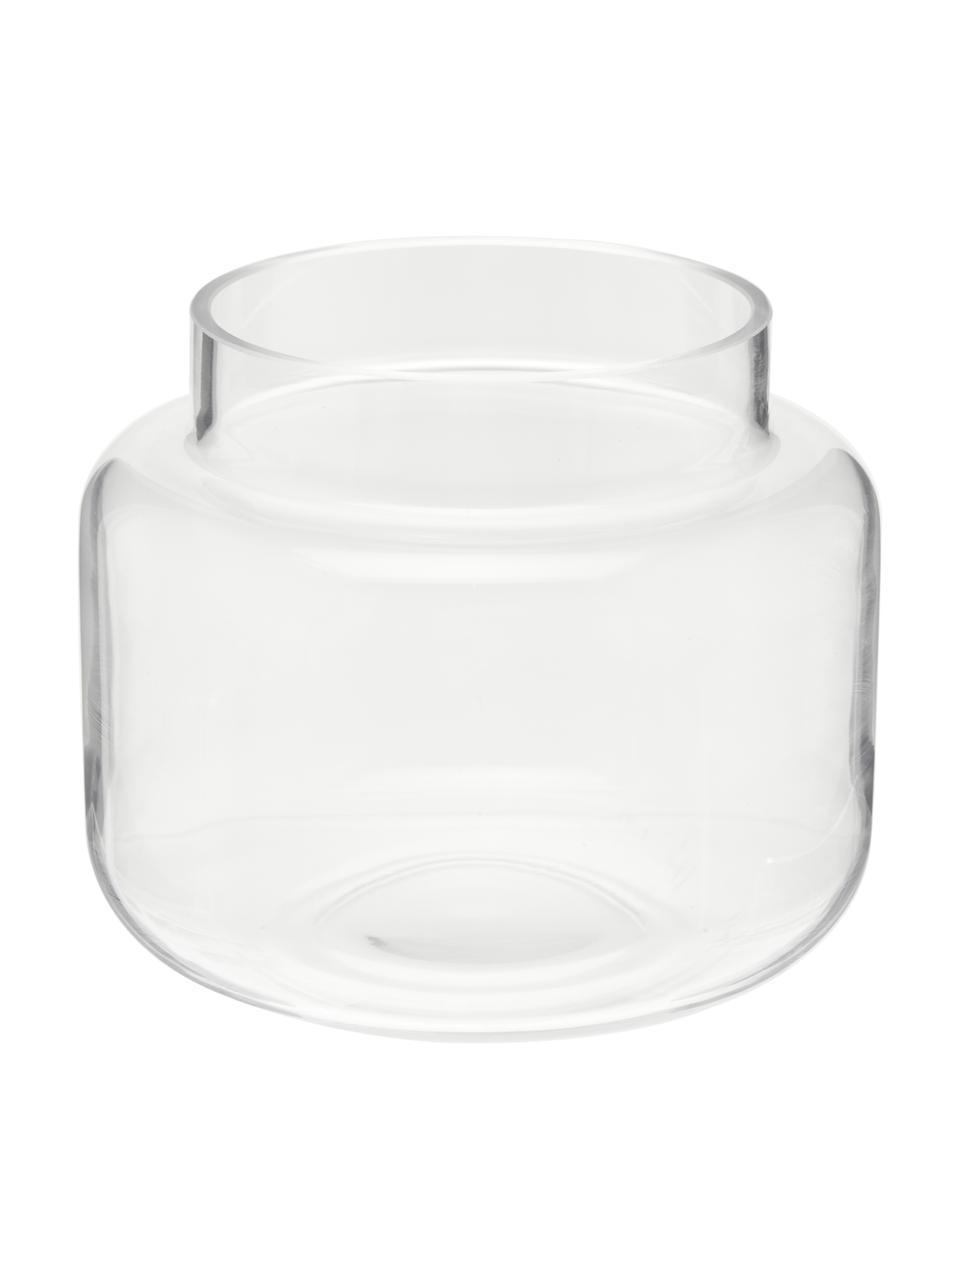 Glazen vaas Lasse, medium, Glas, Transparant, Ø 16 x H 14 cm